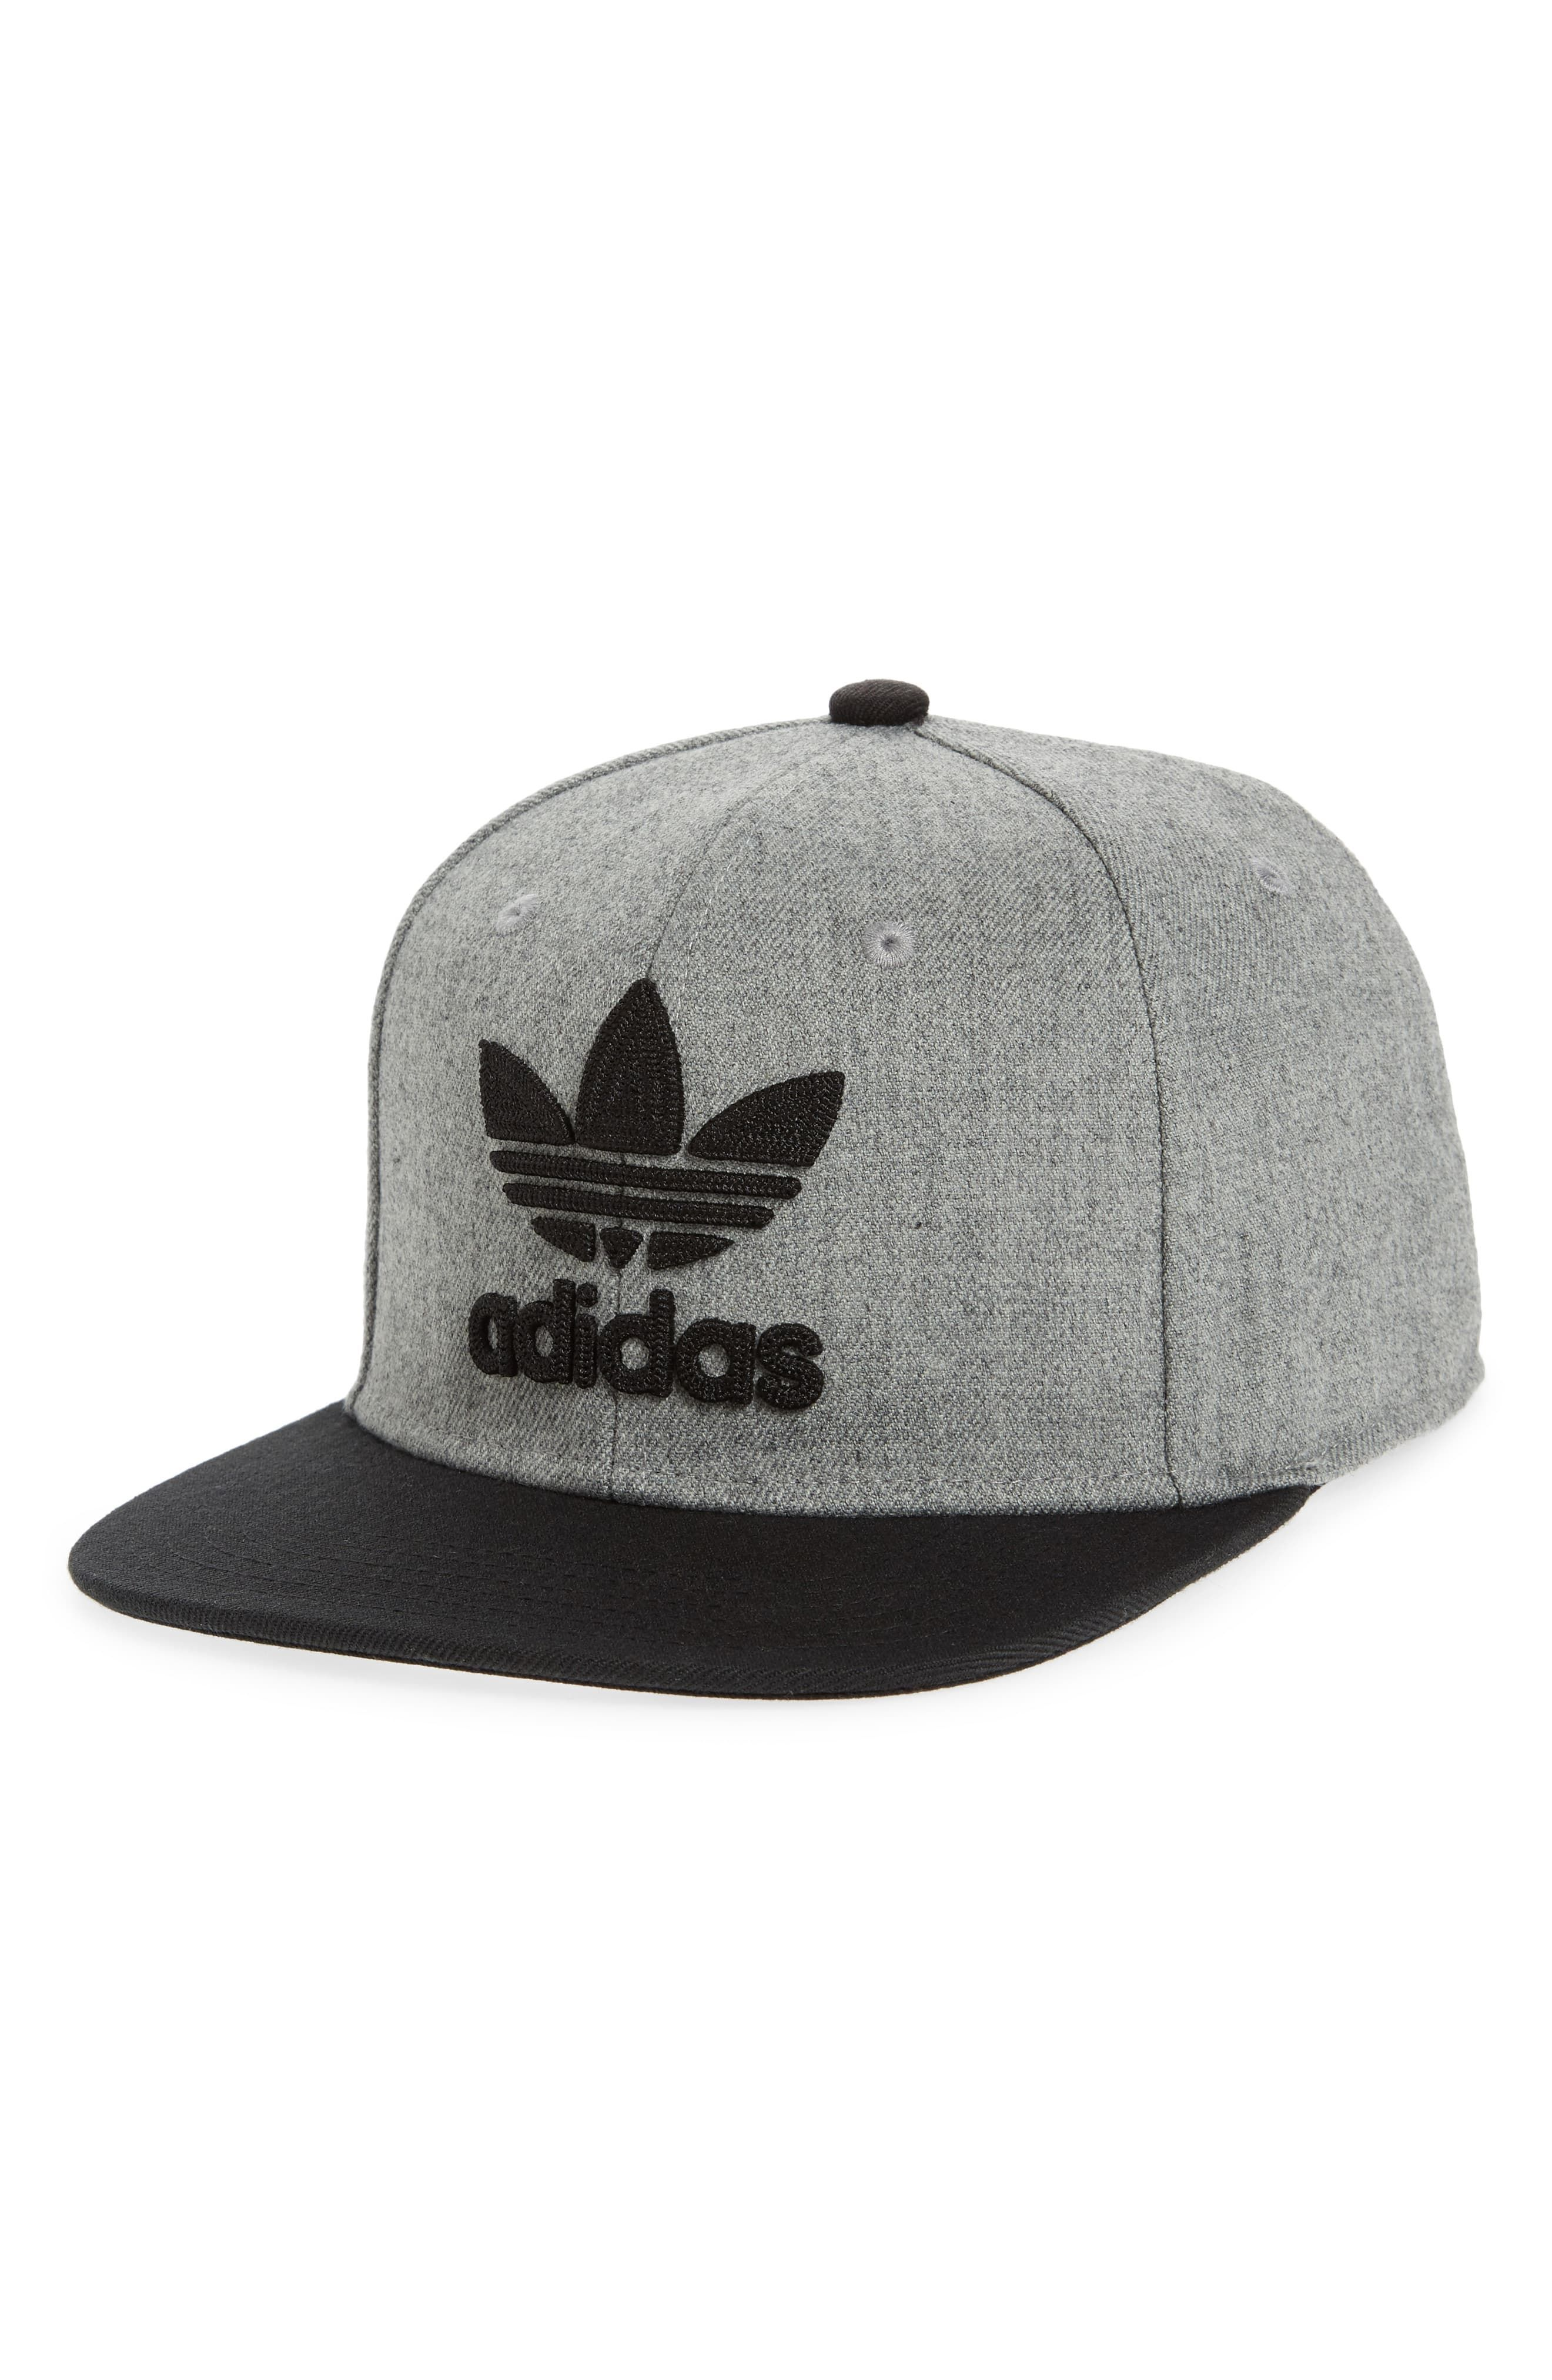 release date 95546 90694 Men s Adidas Originals Trefoil Chain Snapback Baseball Cap - Grey